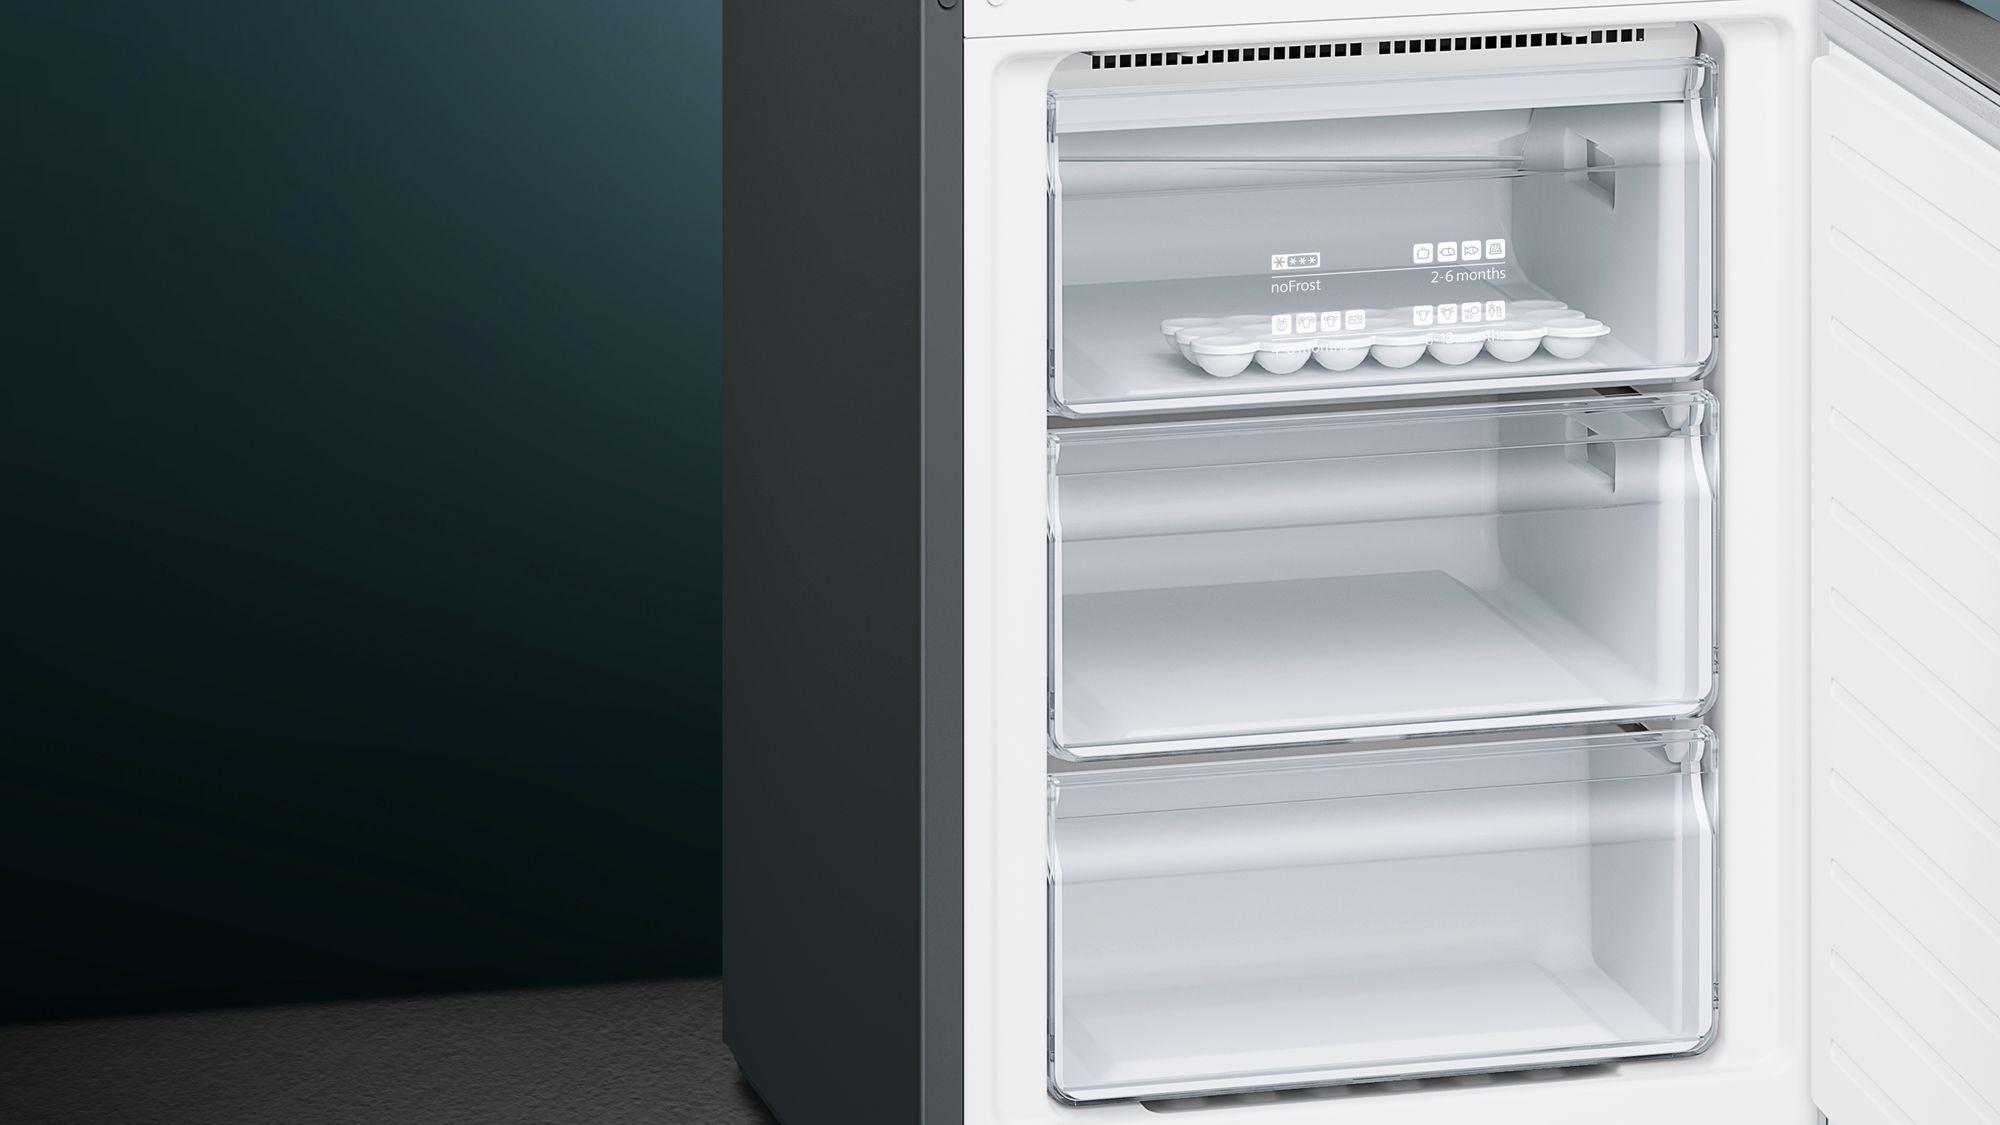 Siemens Kühlschrank Edelstahl : Siemens kühl gefrier kombination edelstahl antifingerprint